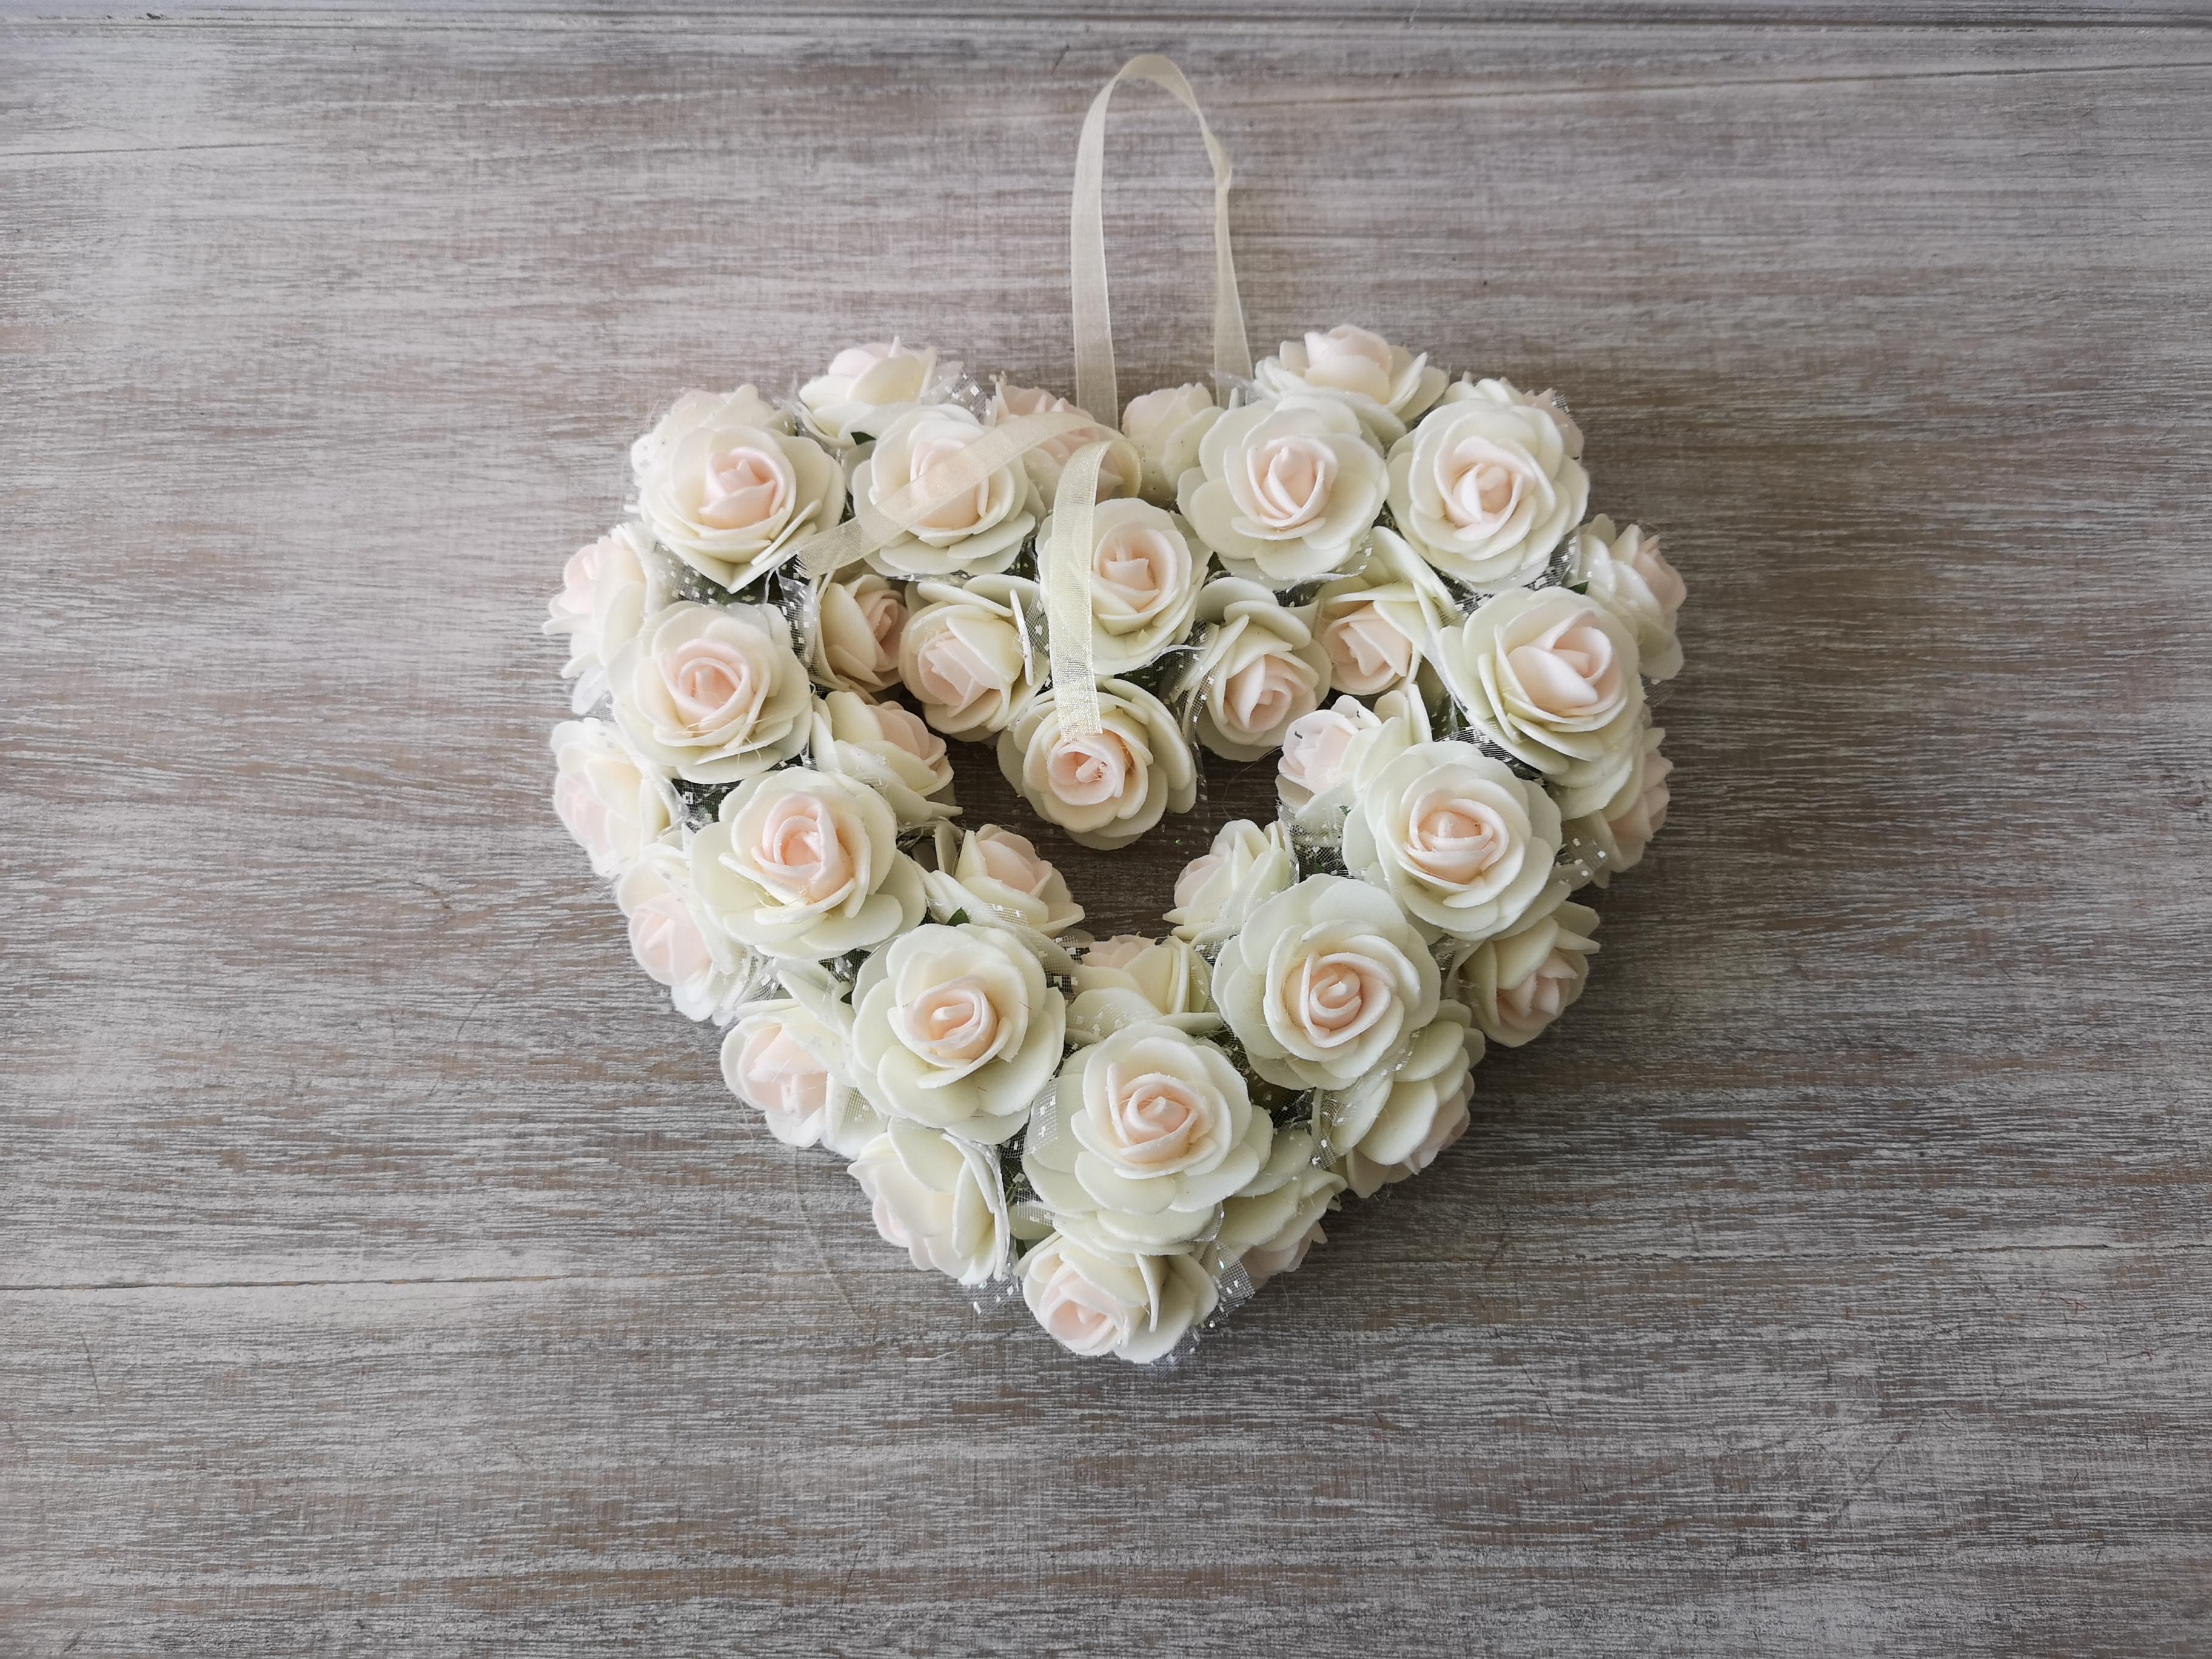 Medium Ivory Rose Heart Wreath Medium-Ivory-Rose-Heart-Wreath